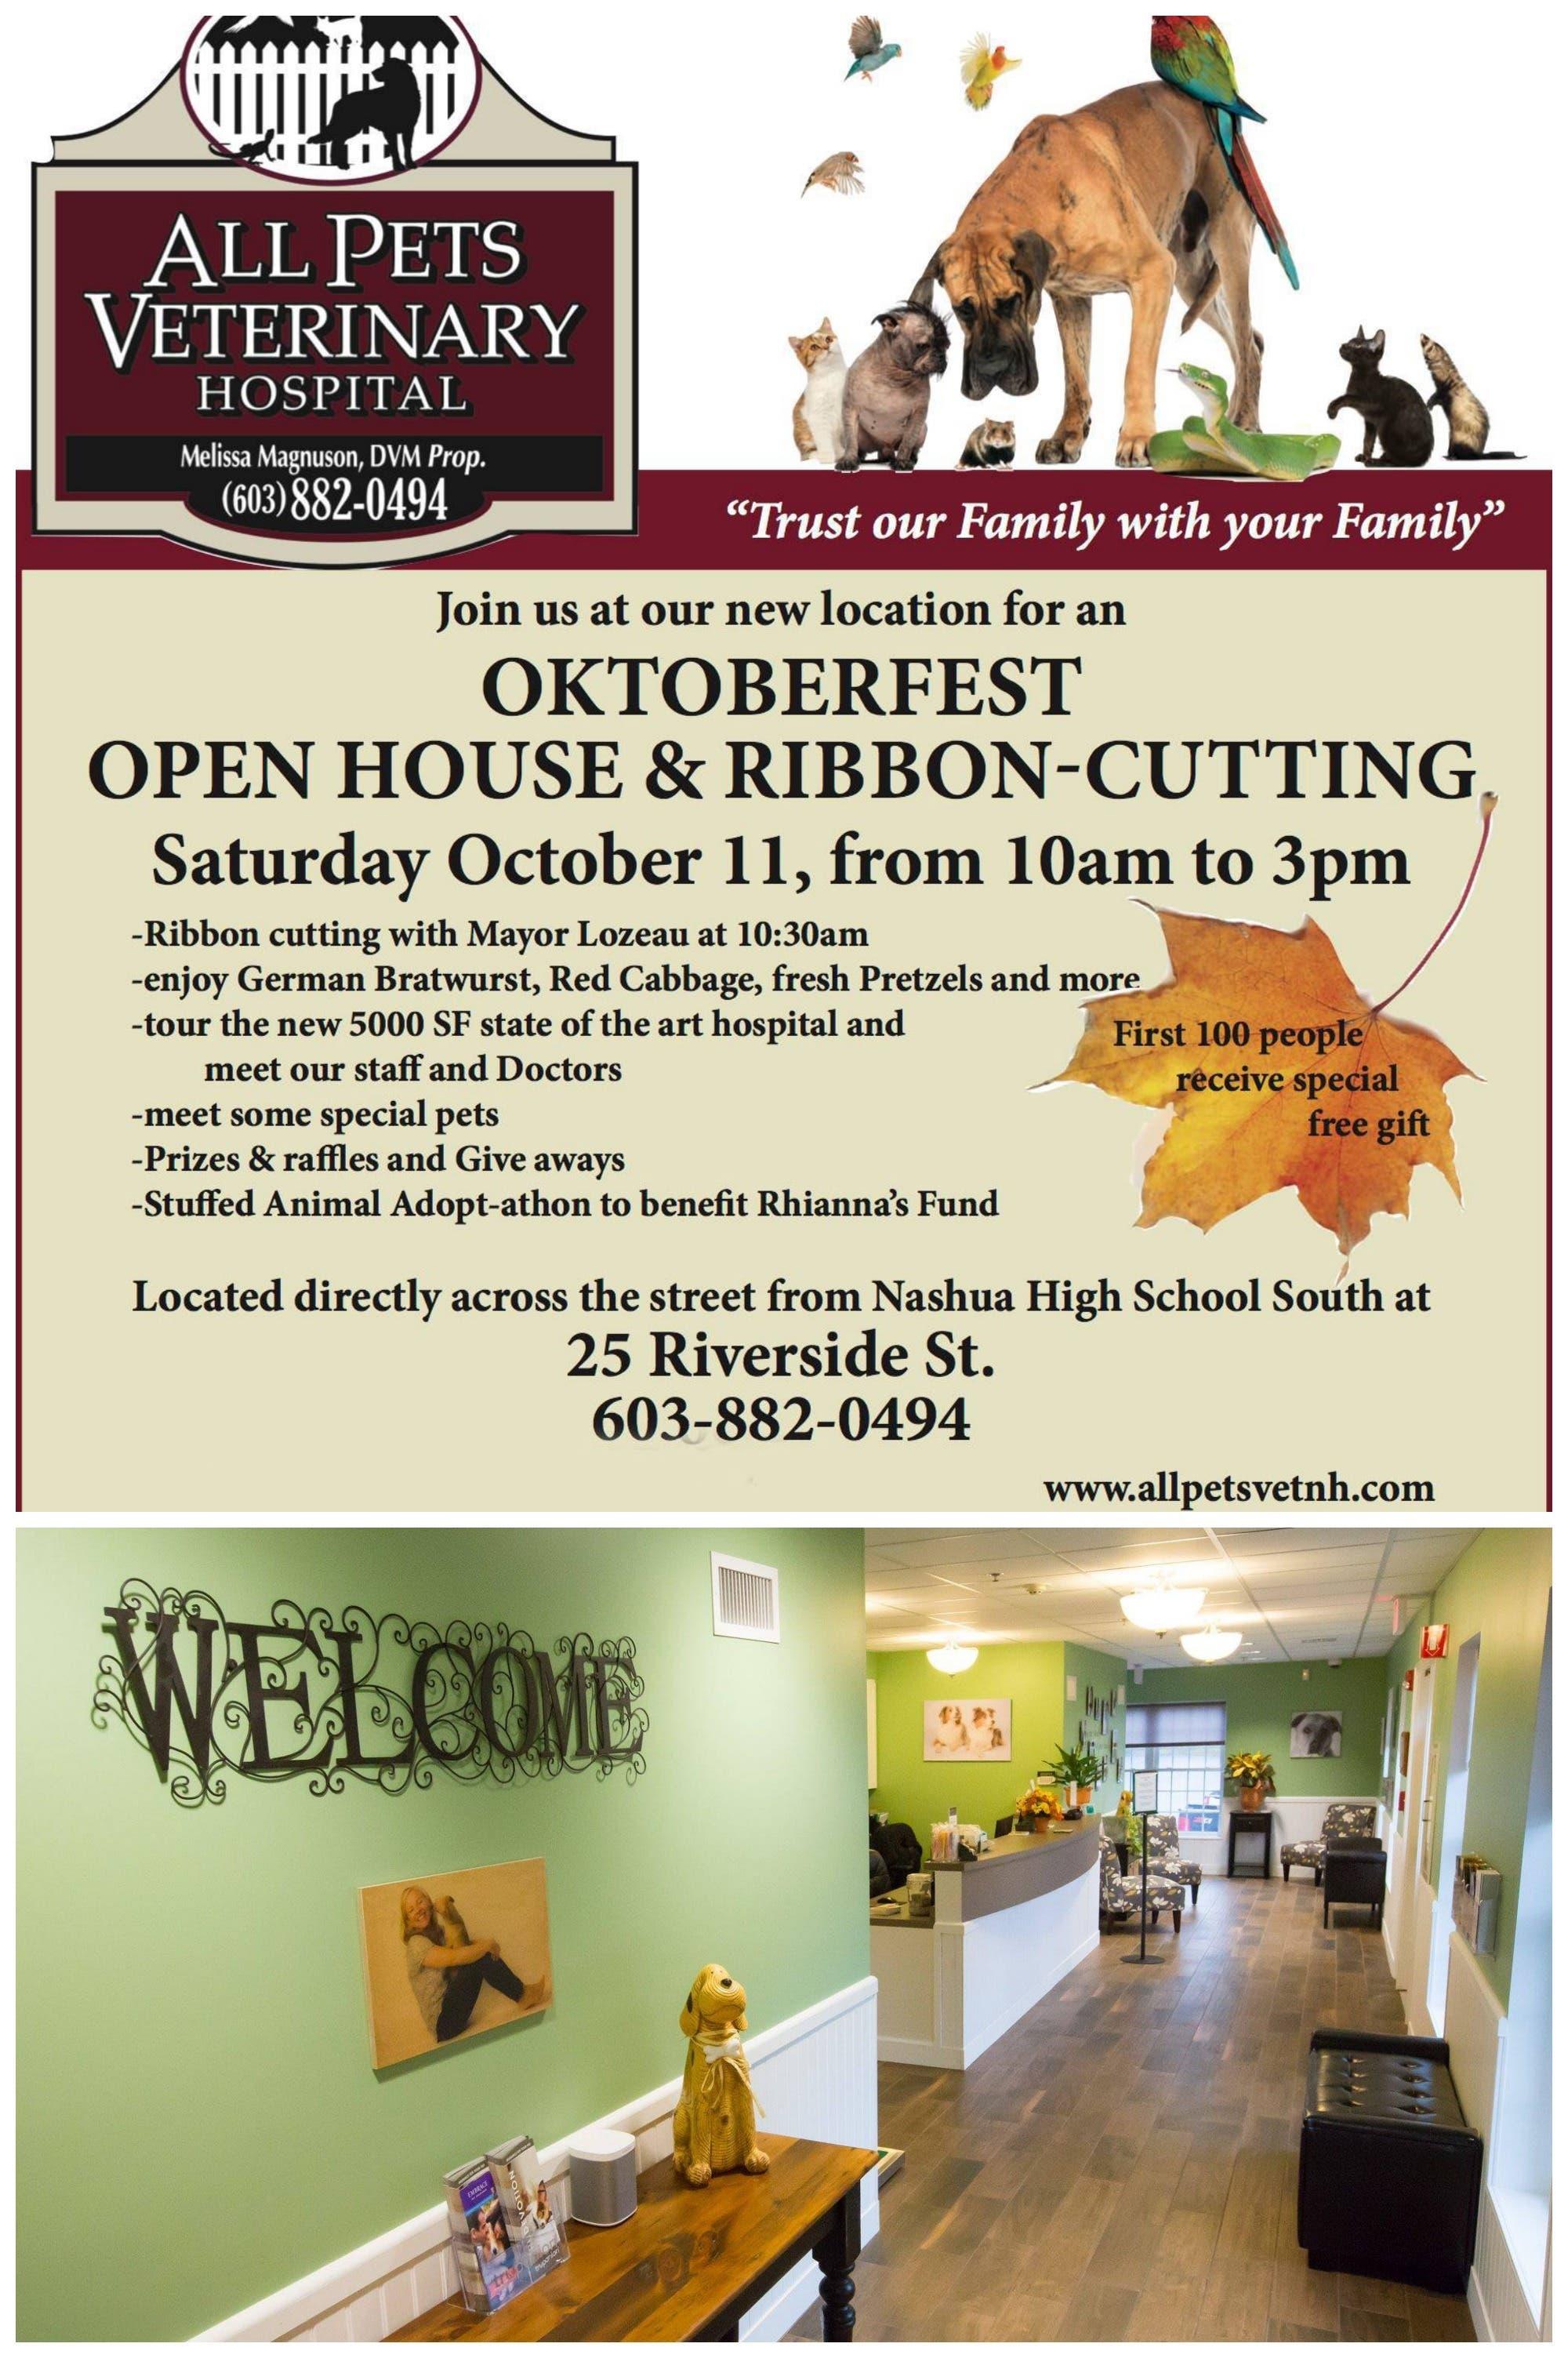 All Pets Veterinary Hospital To Host Grand Opening Oktoberfest